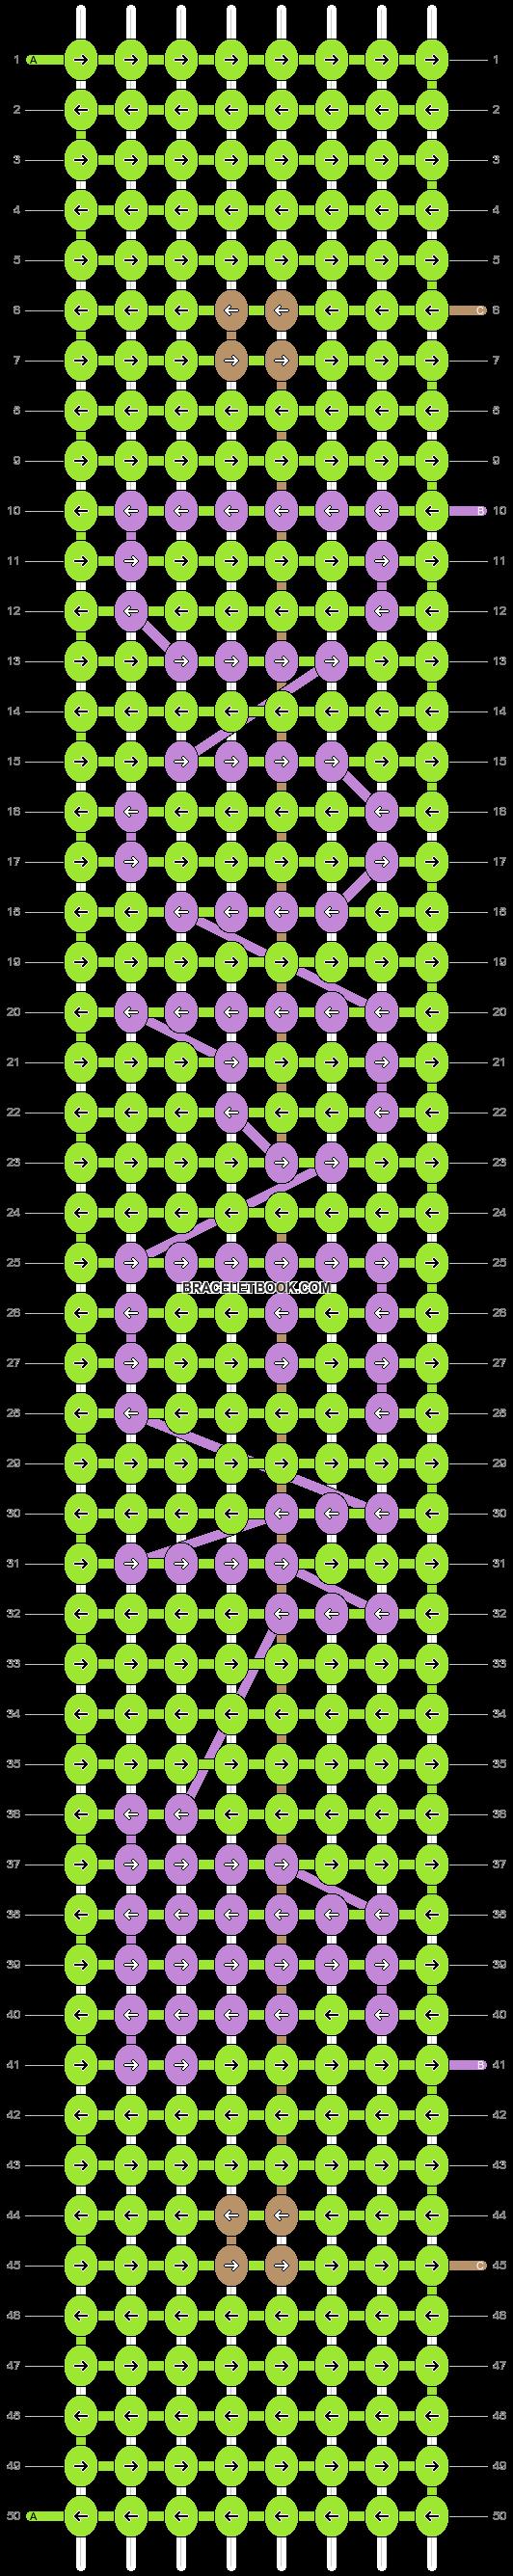 Alpha pattern #20876 pattern